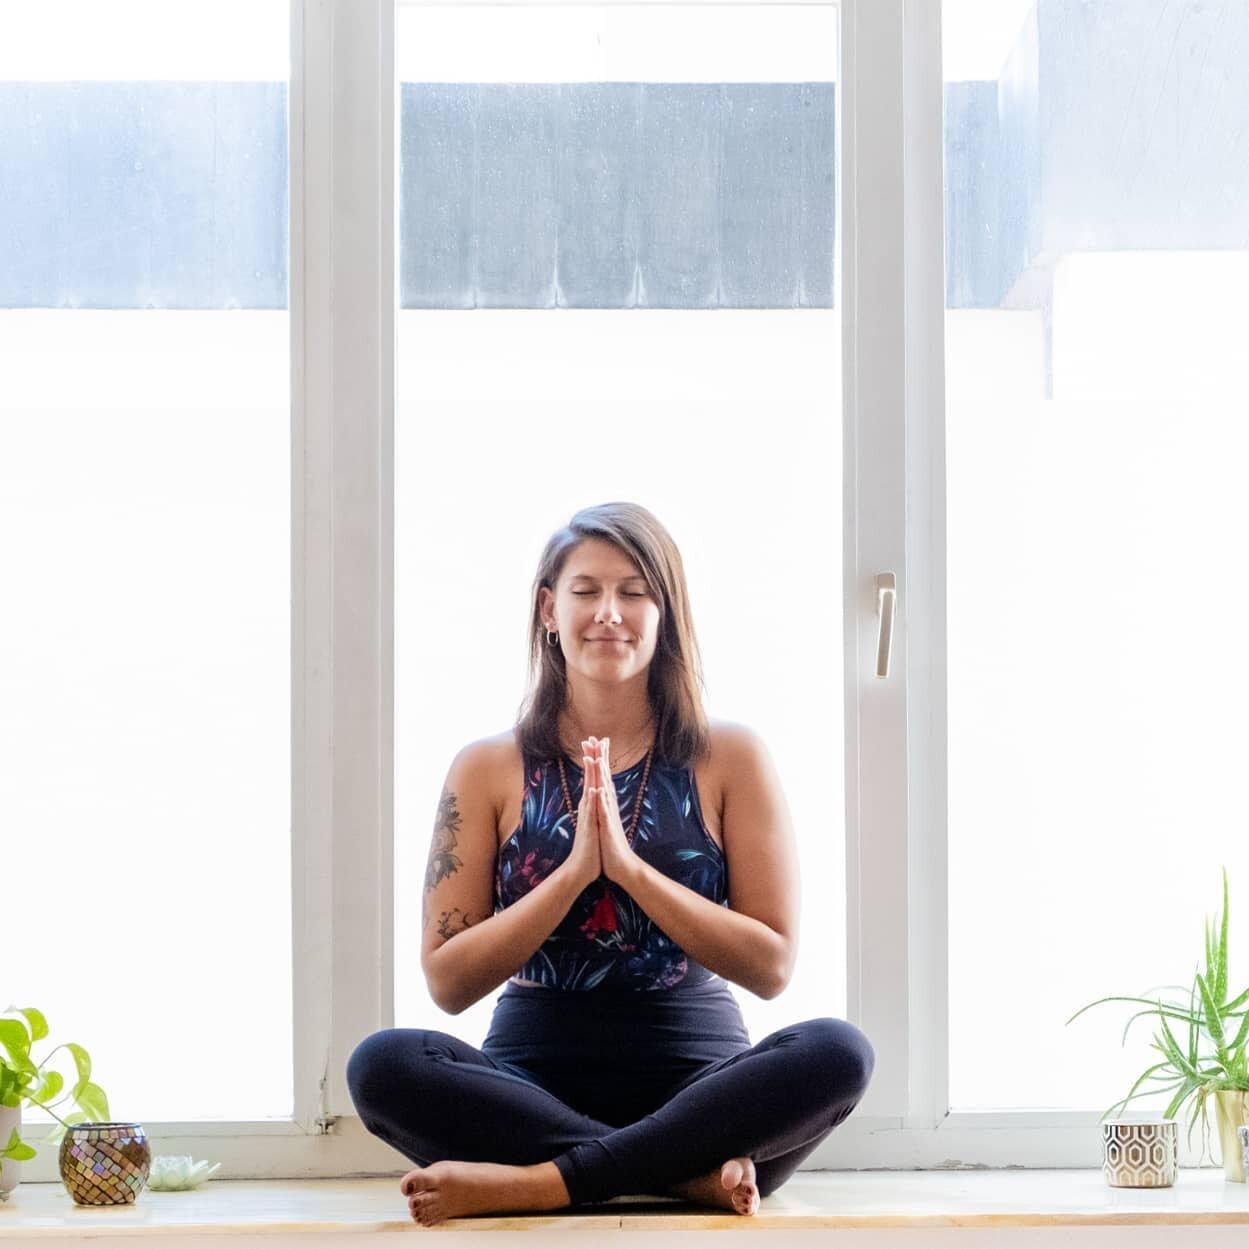 Yoga-Hose Gesicht sitzen